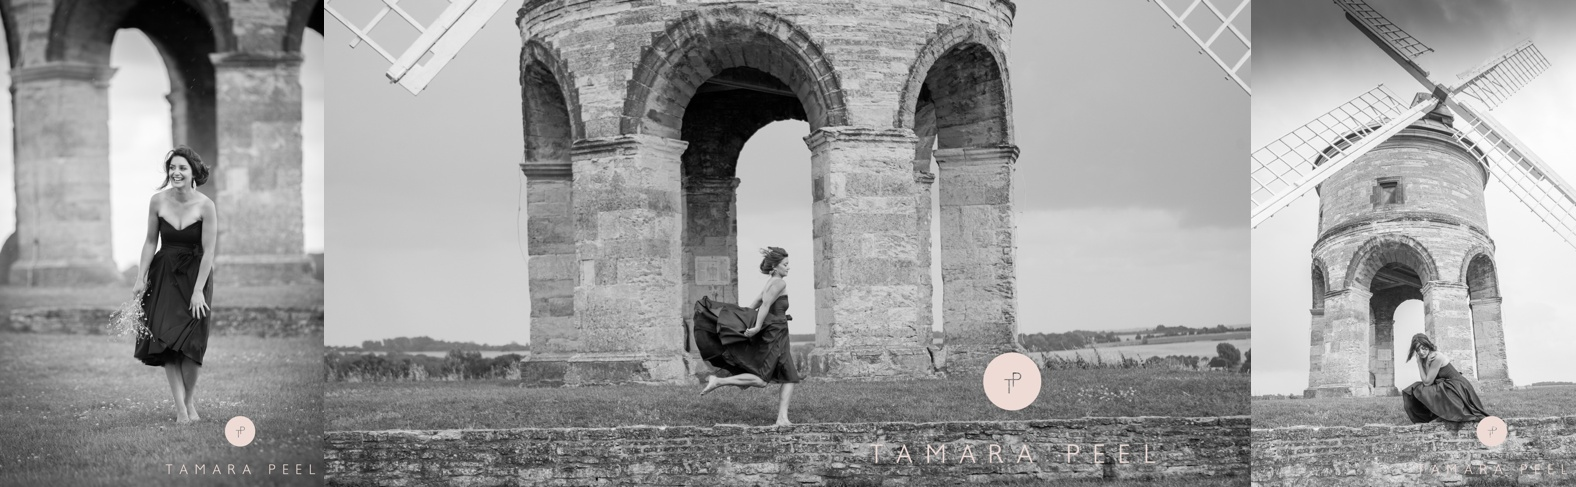 Tamara Peel. V,Macken,photographer,female_0092